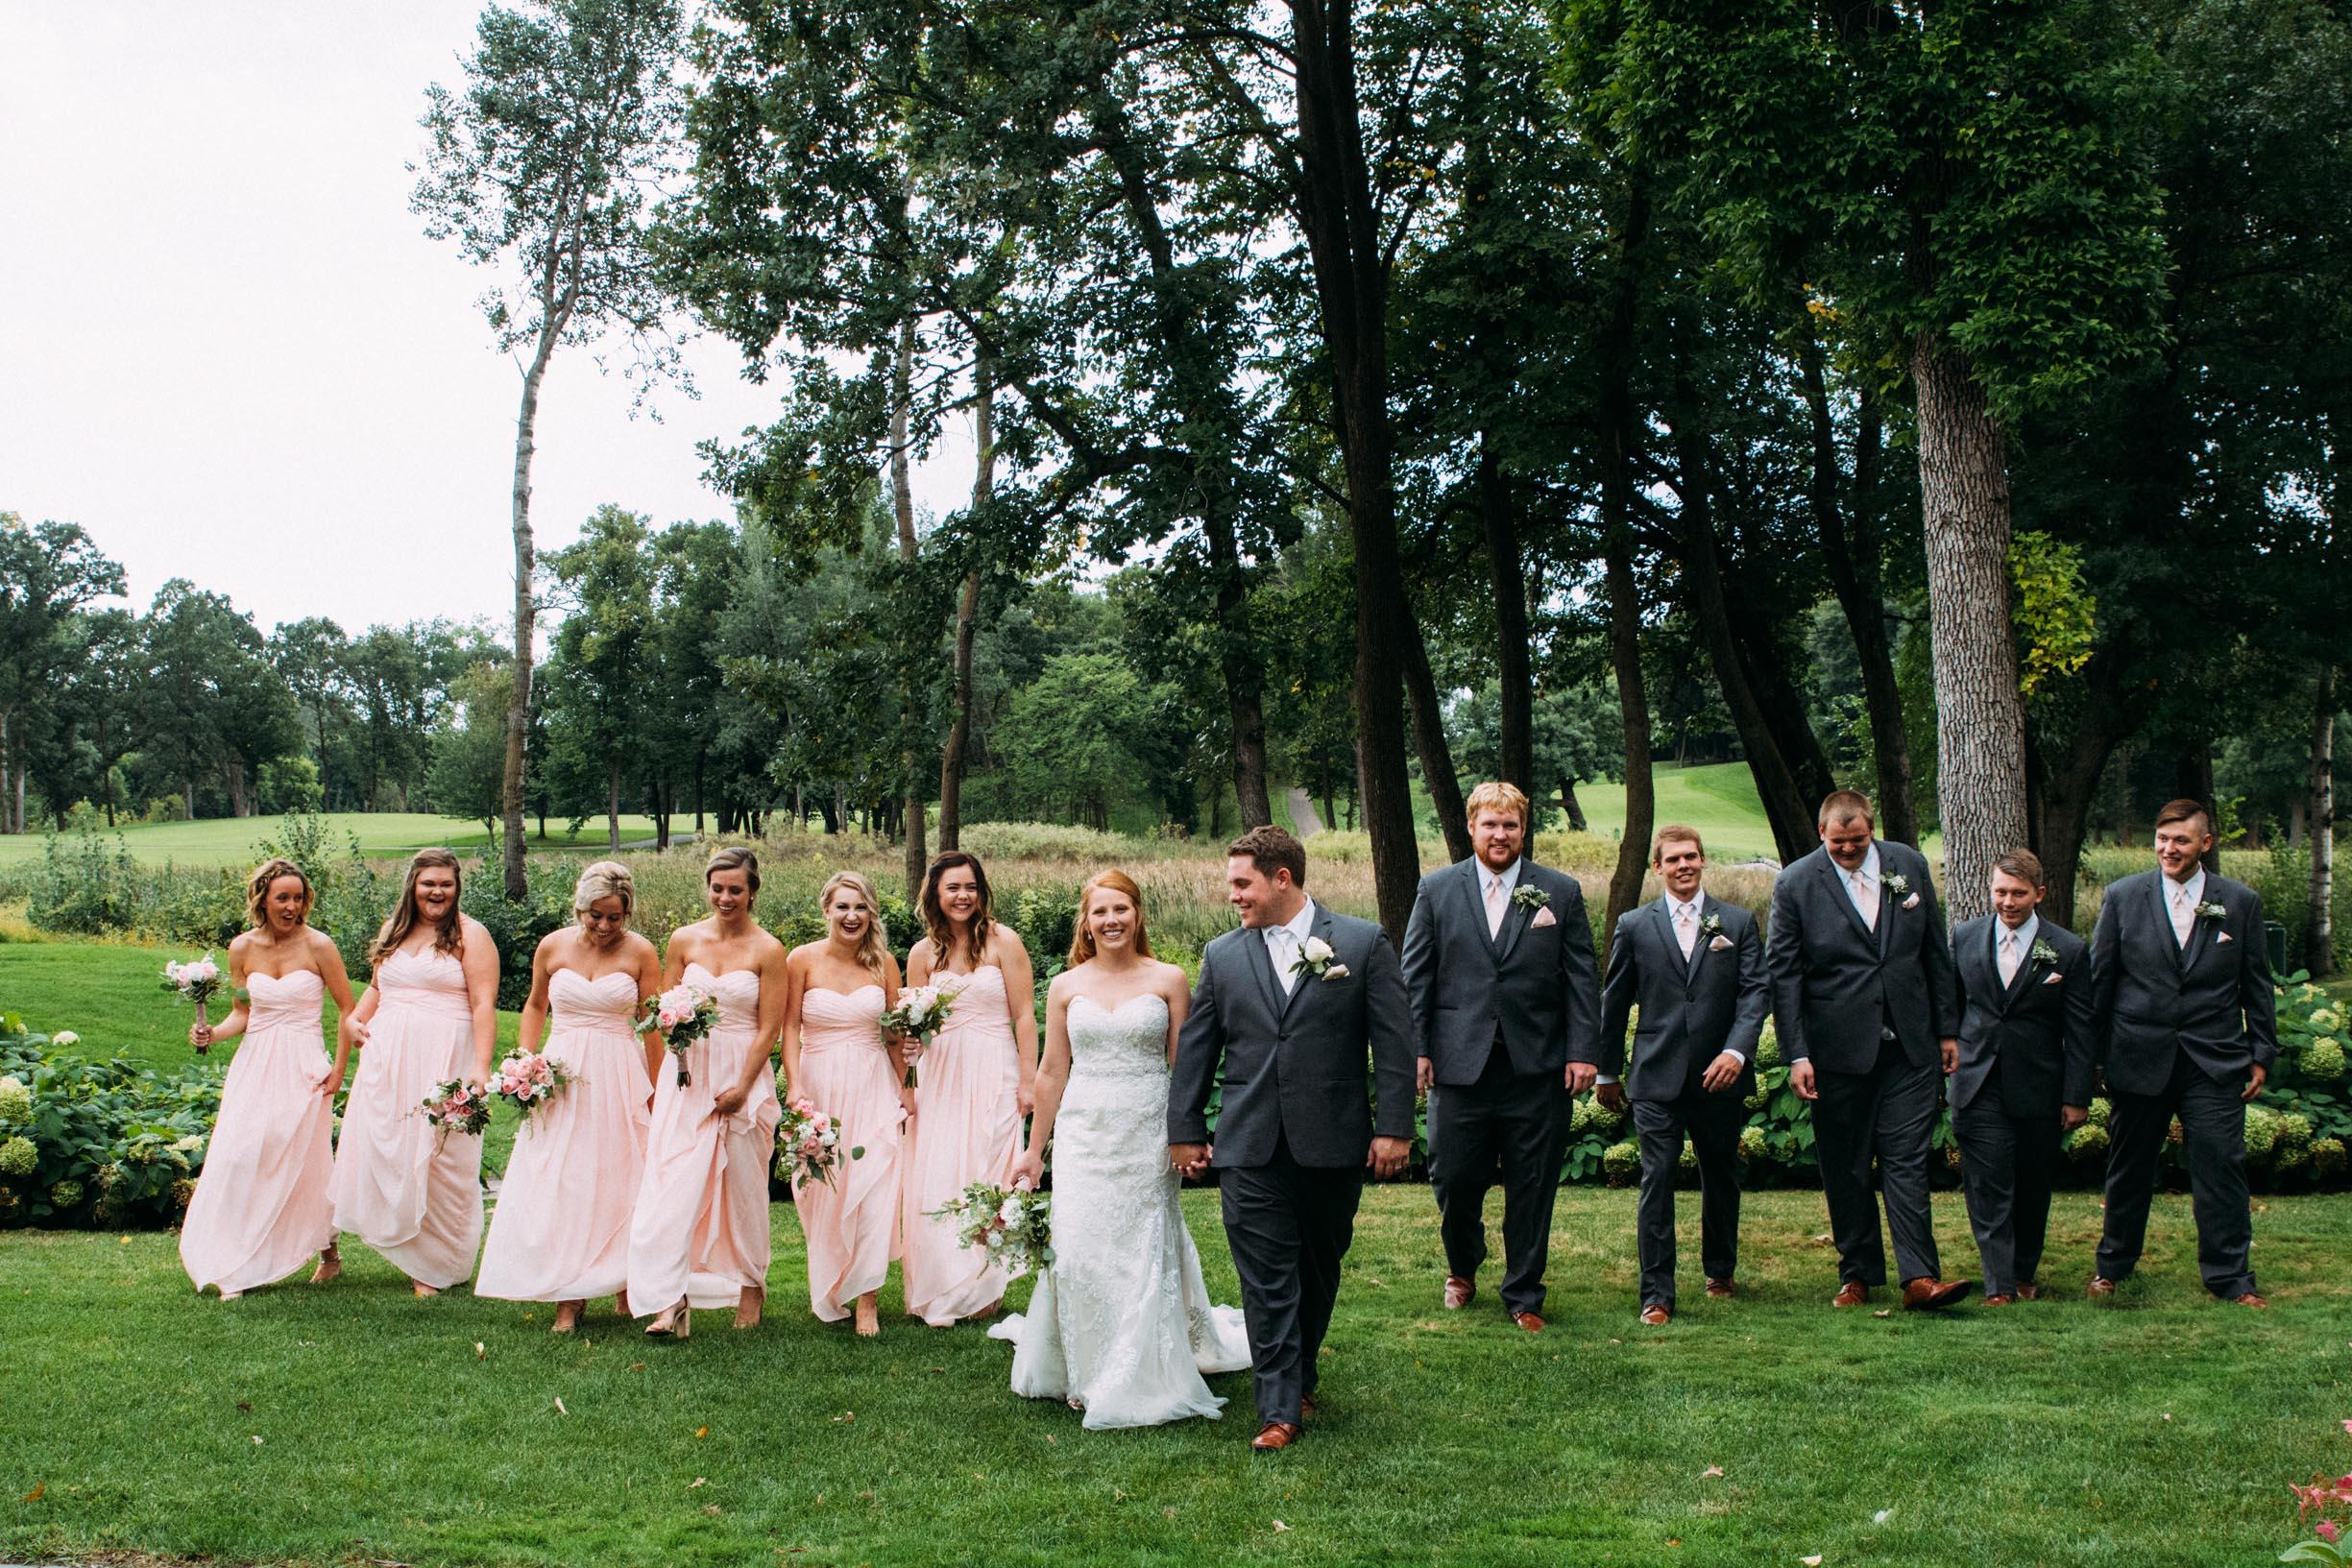 Megan_Zach_Minneapolis_Bearpath_Wedding_Blog-22.jpg